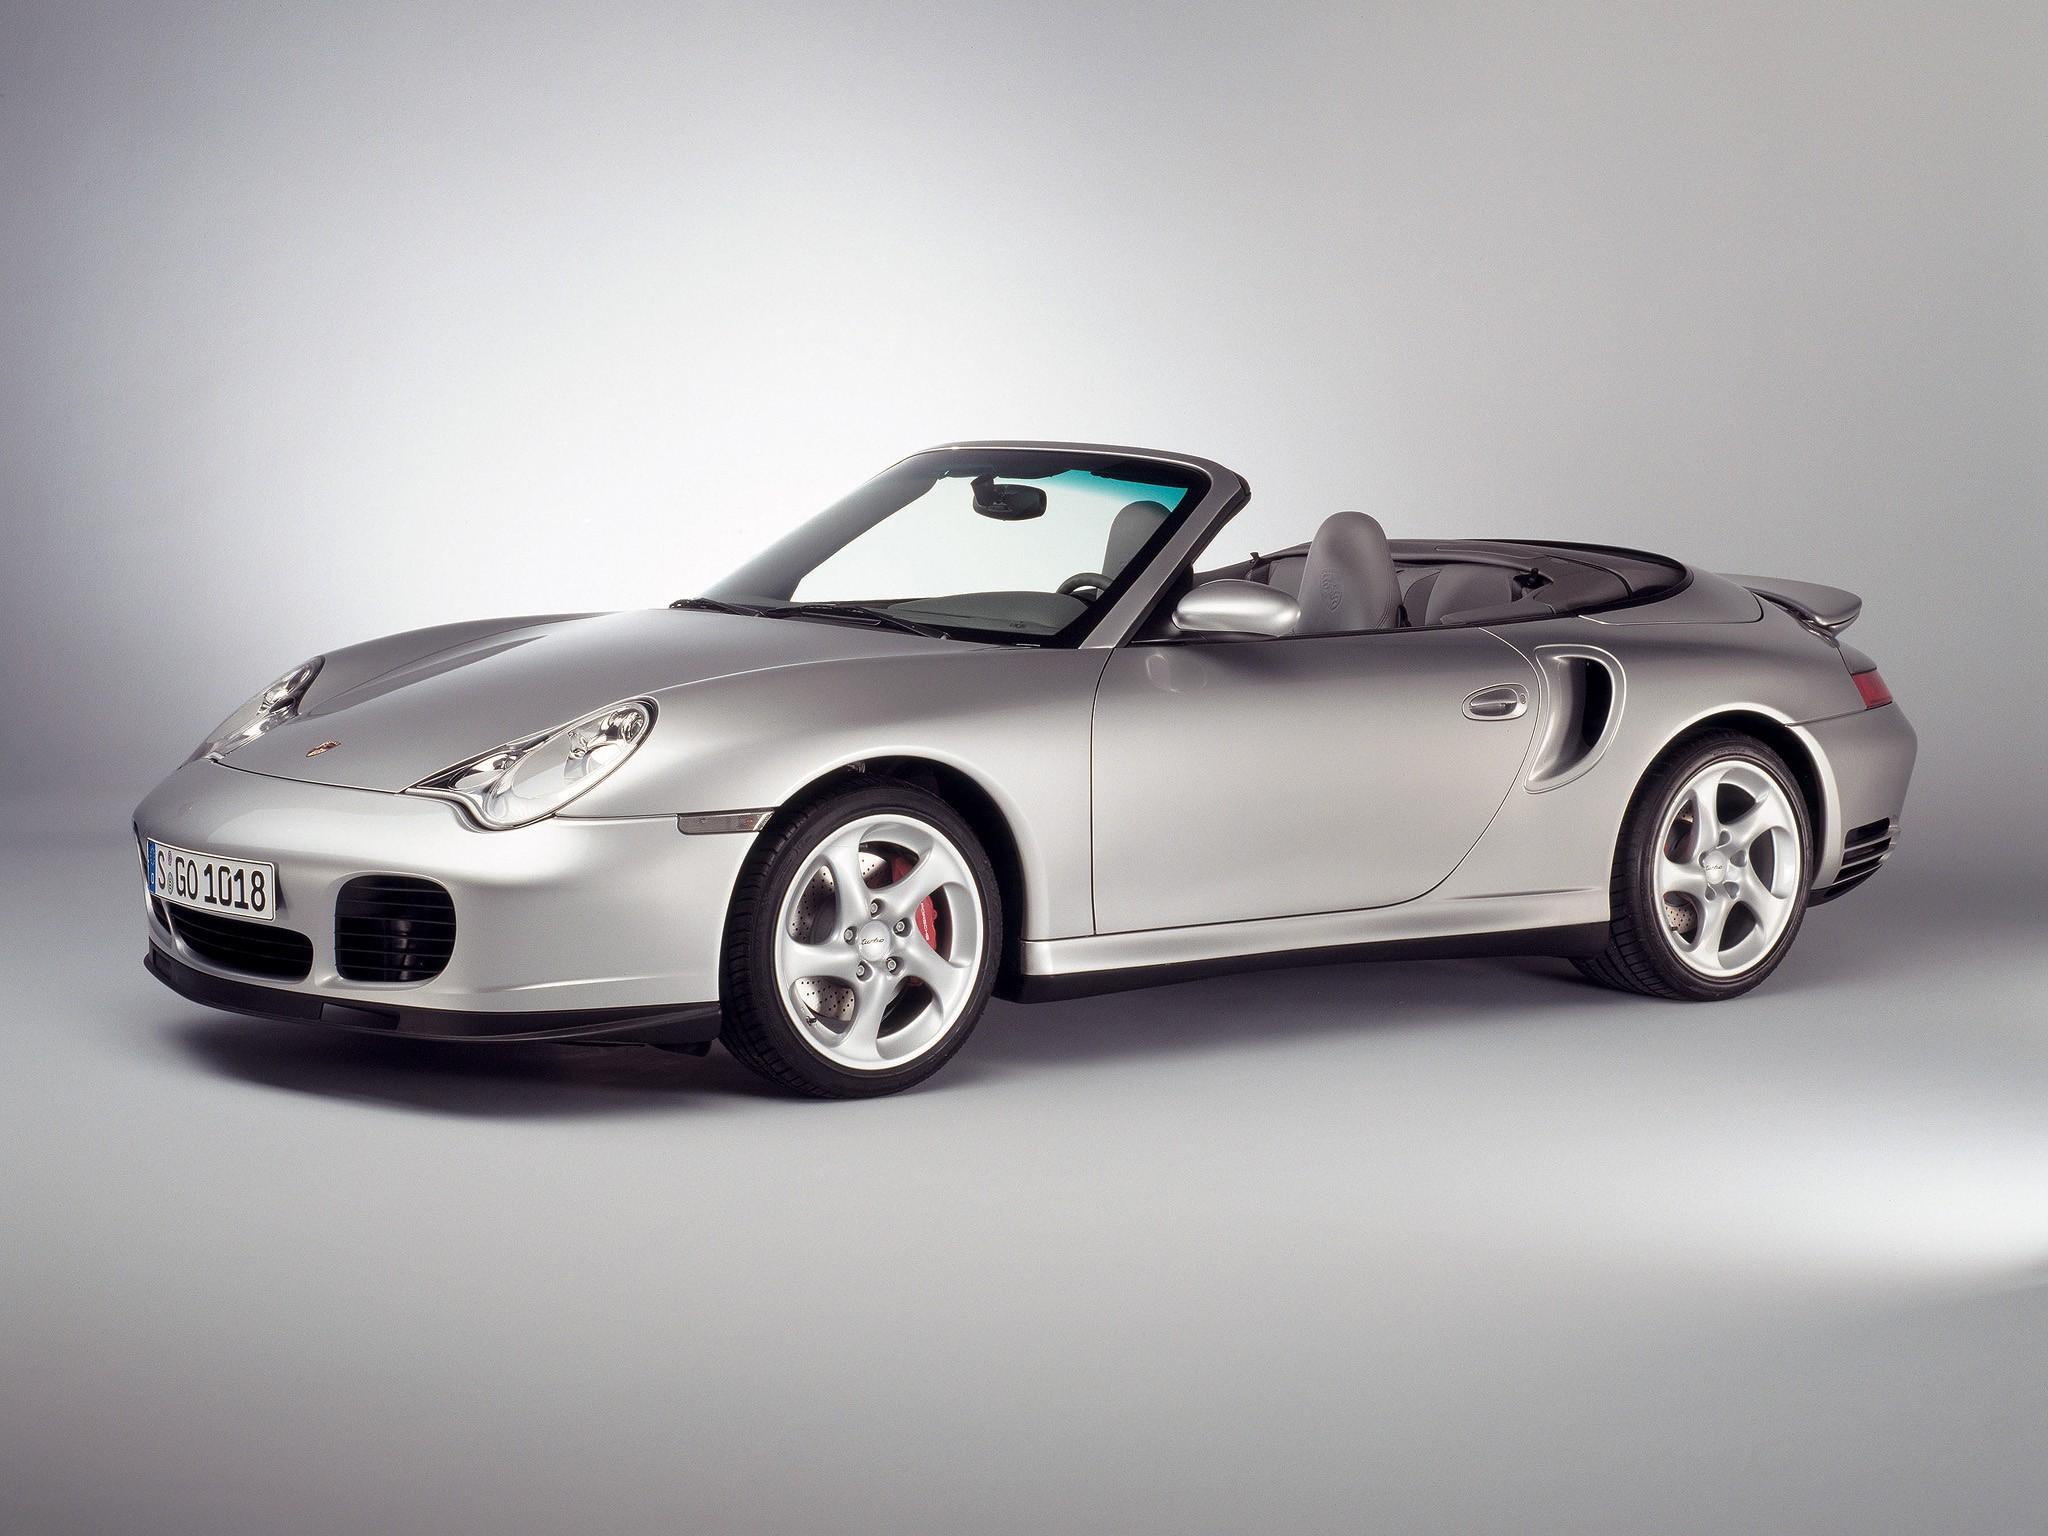 porsche 911 turbo cabriolet 996 specs 2004 2005 2006 2007 autoevolution. Black Bedroom Furniture Sets. Home Design Ideas